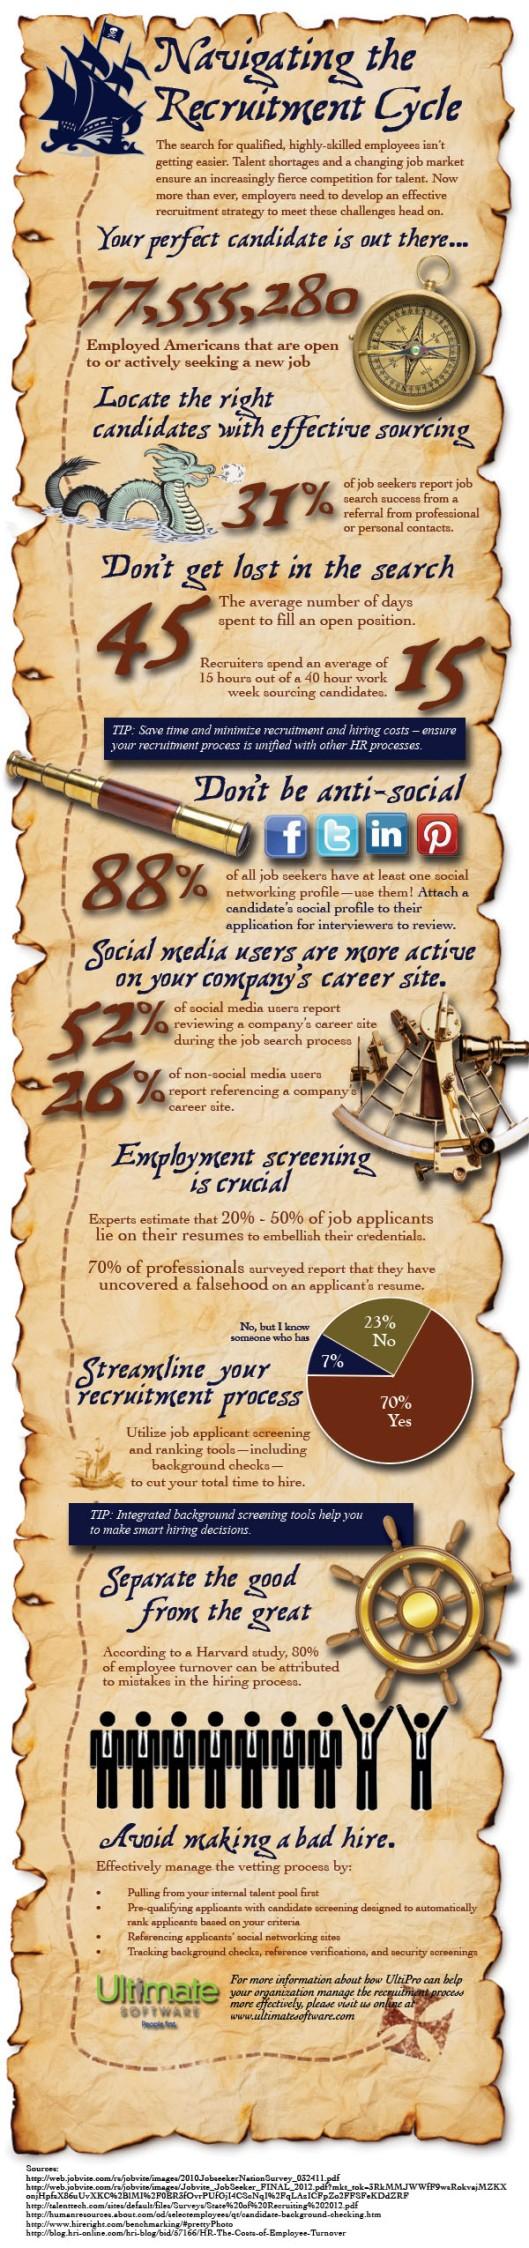 RecruitmentInfographic